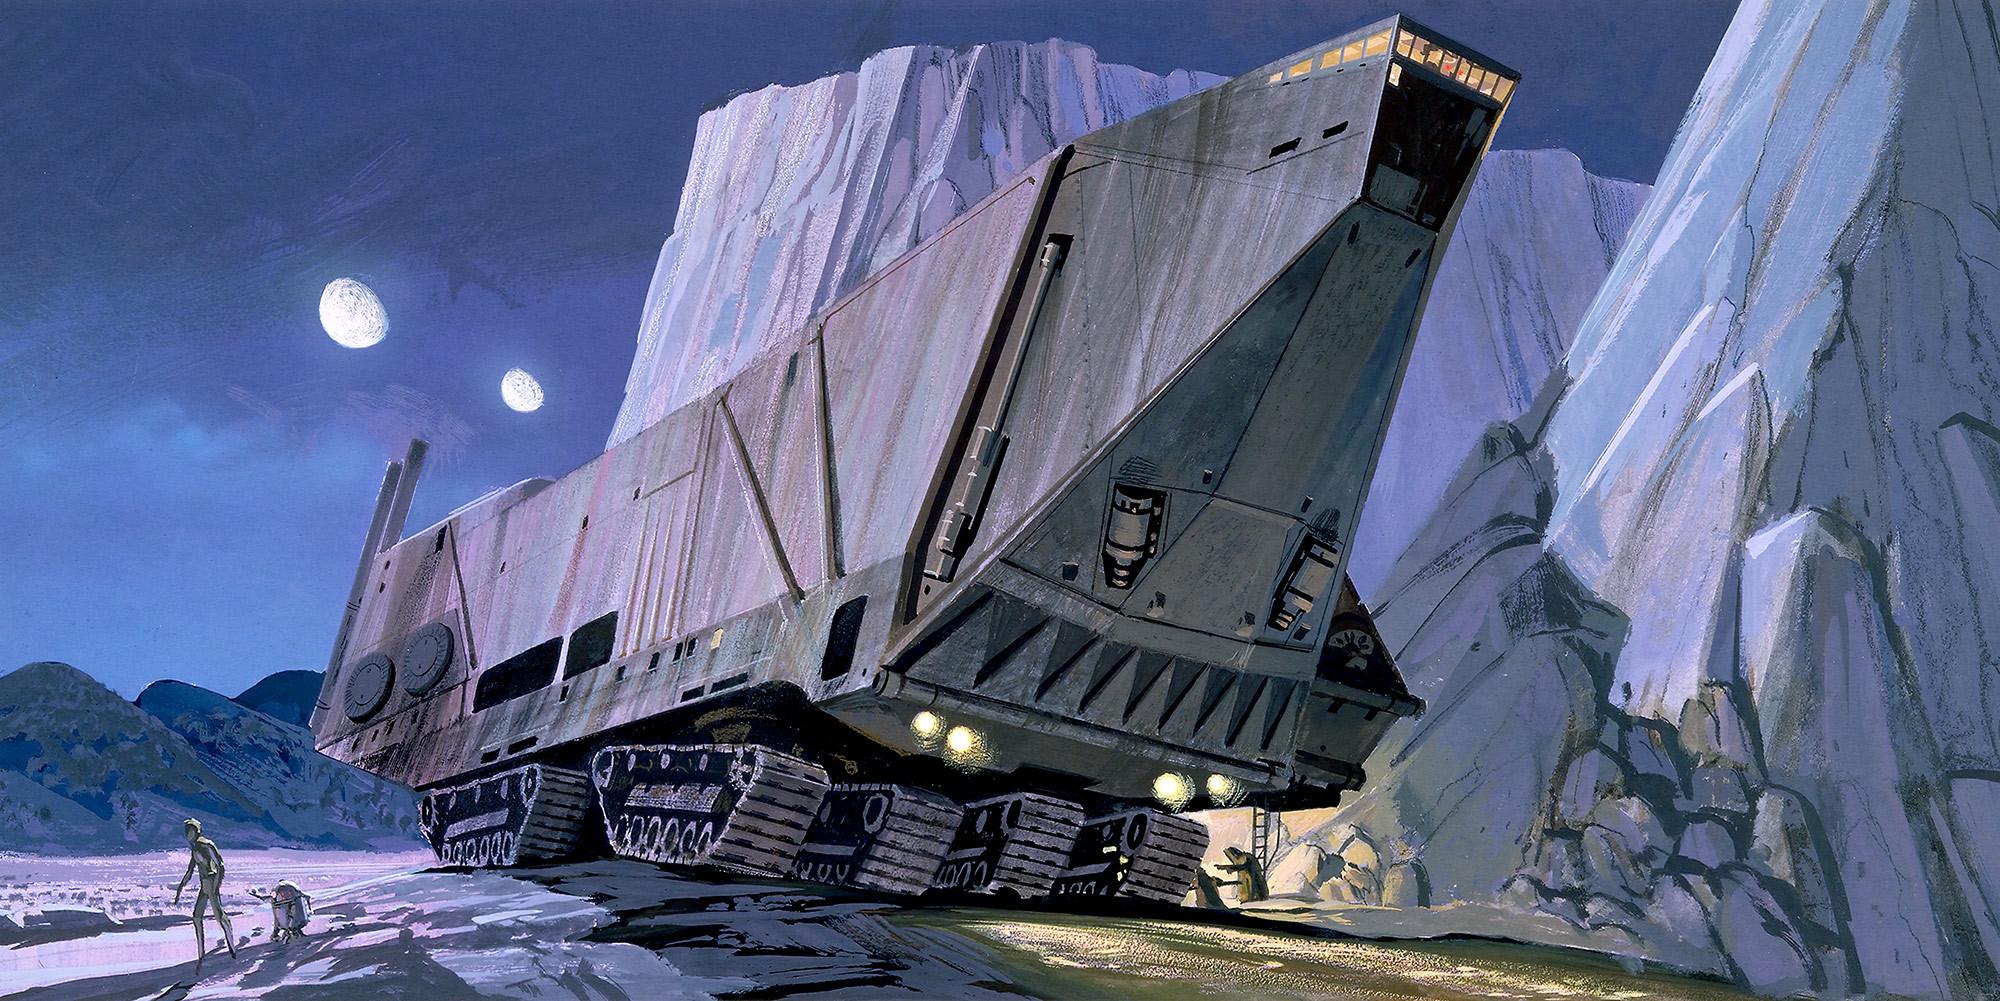 Star Wars Classic RMQ Sandcrawler